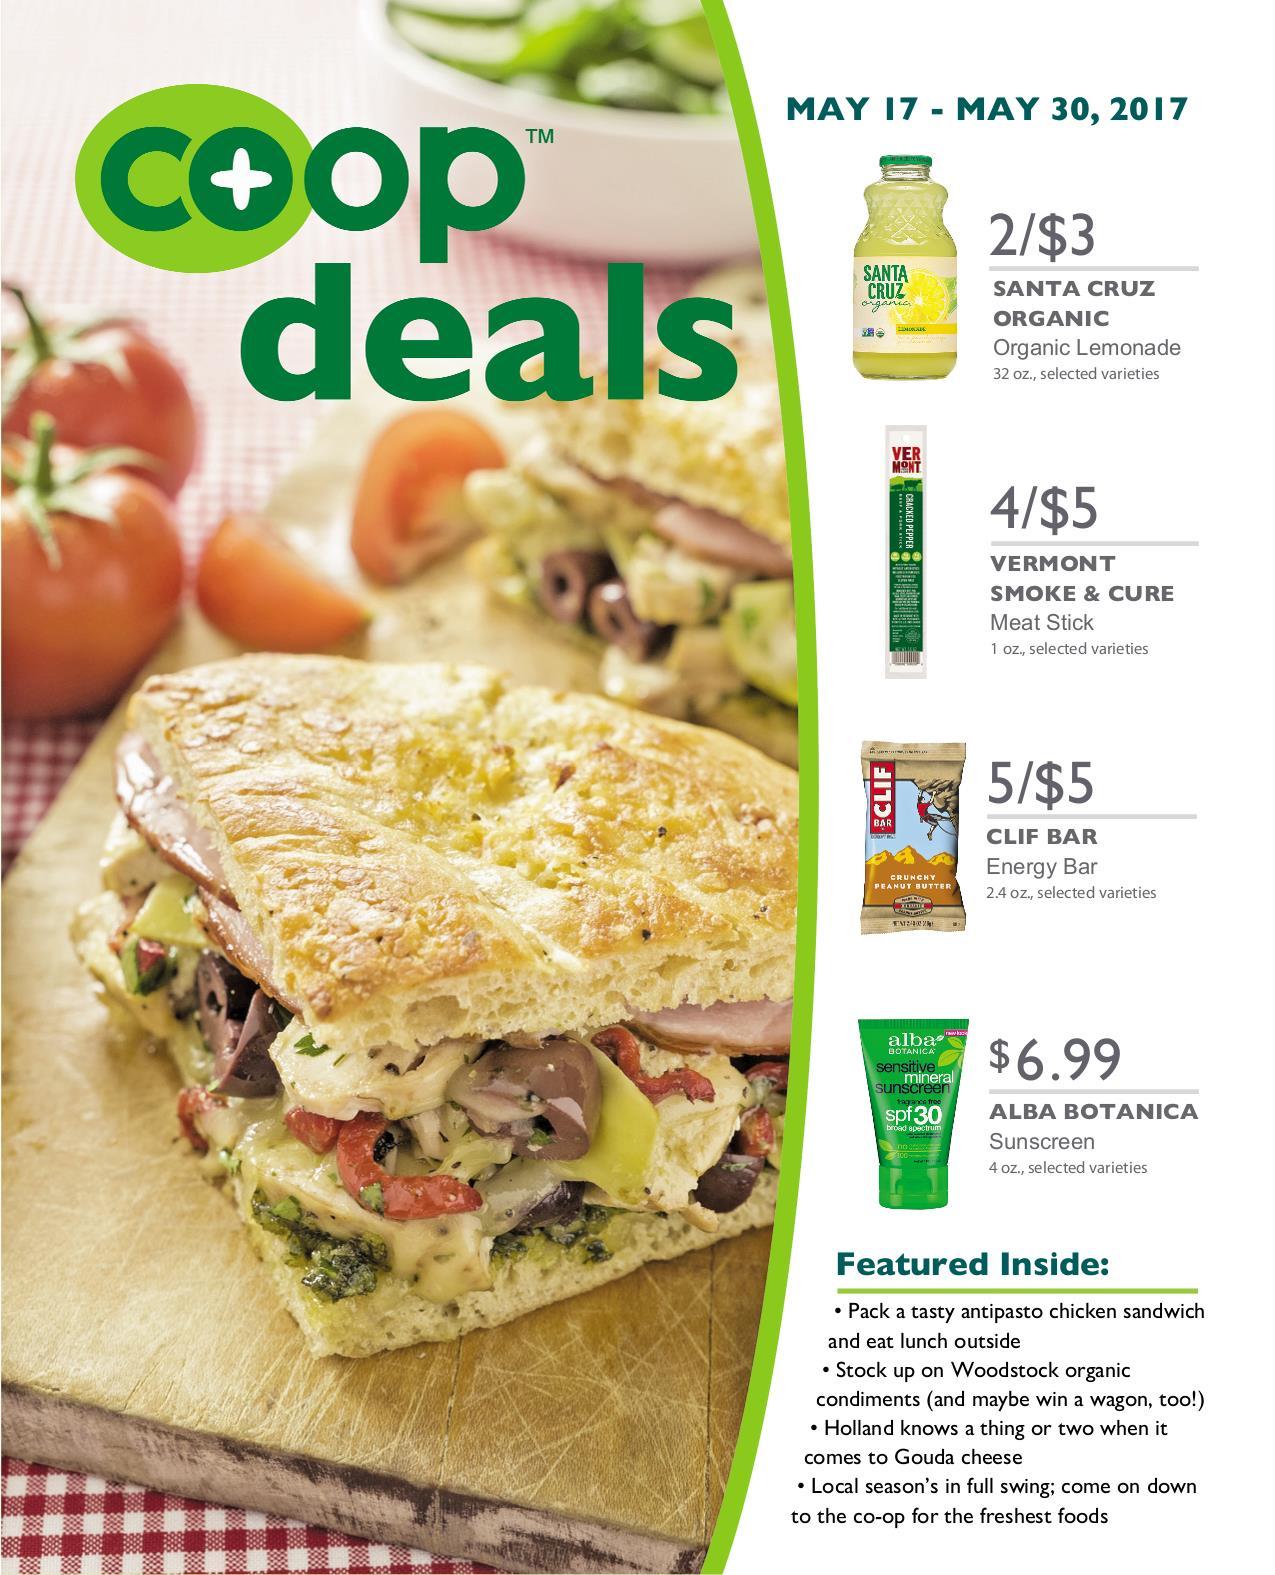 Co+op Deals May 2017 - Flyer B